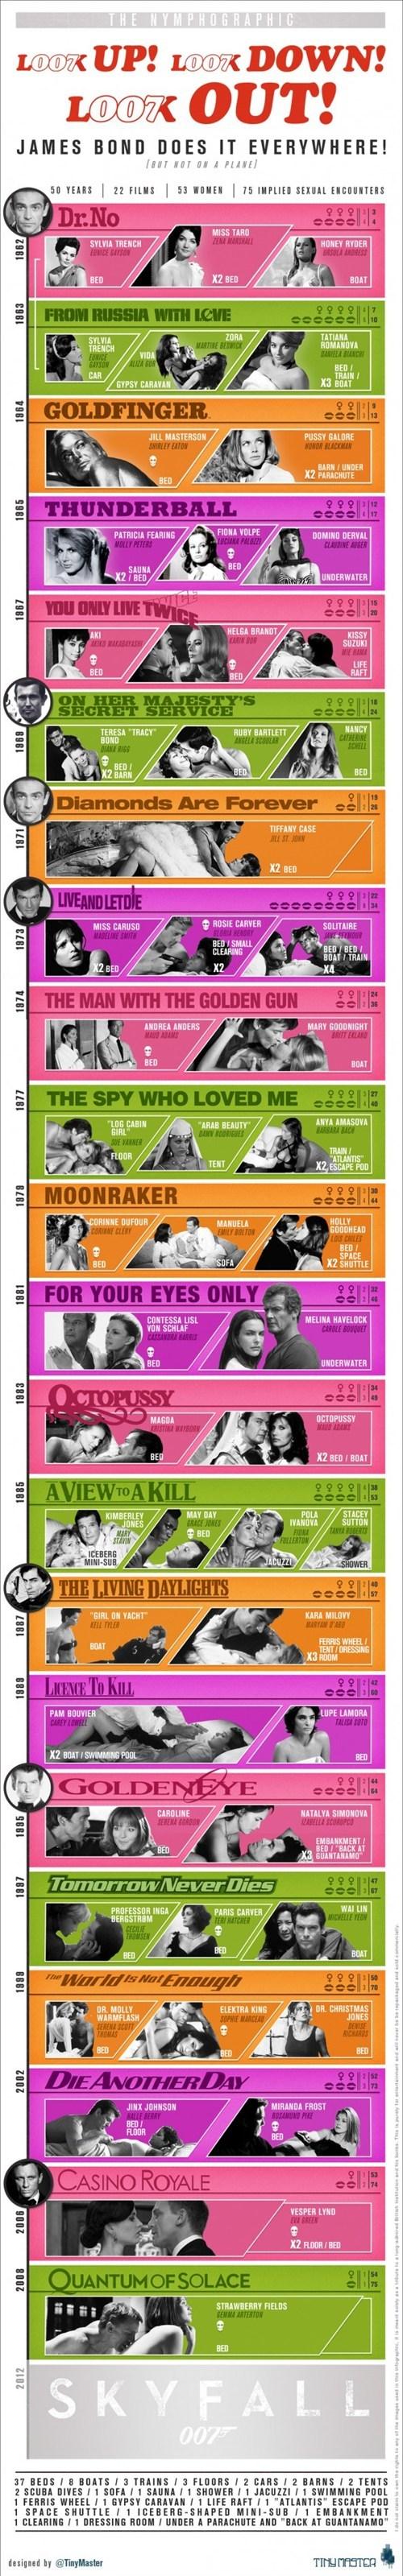 sexytime movies james bond - 6763785984